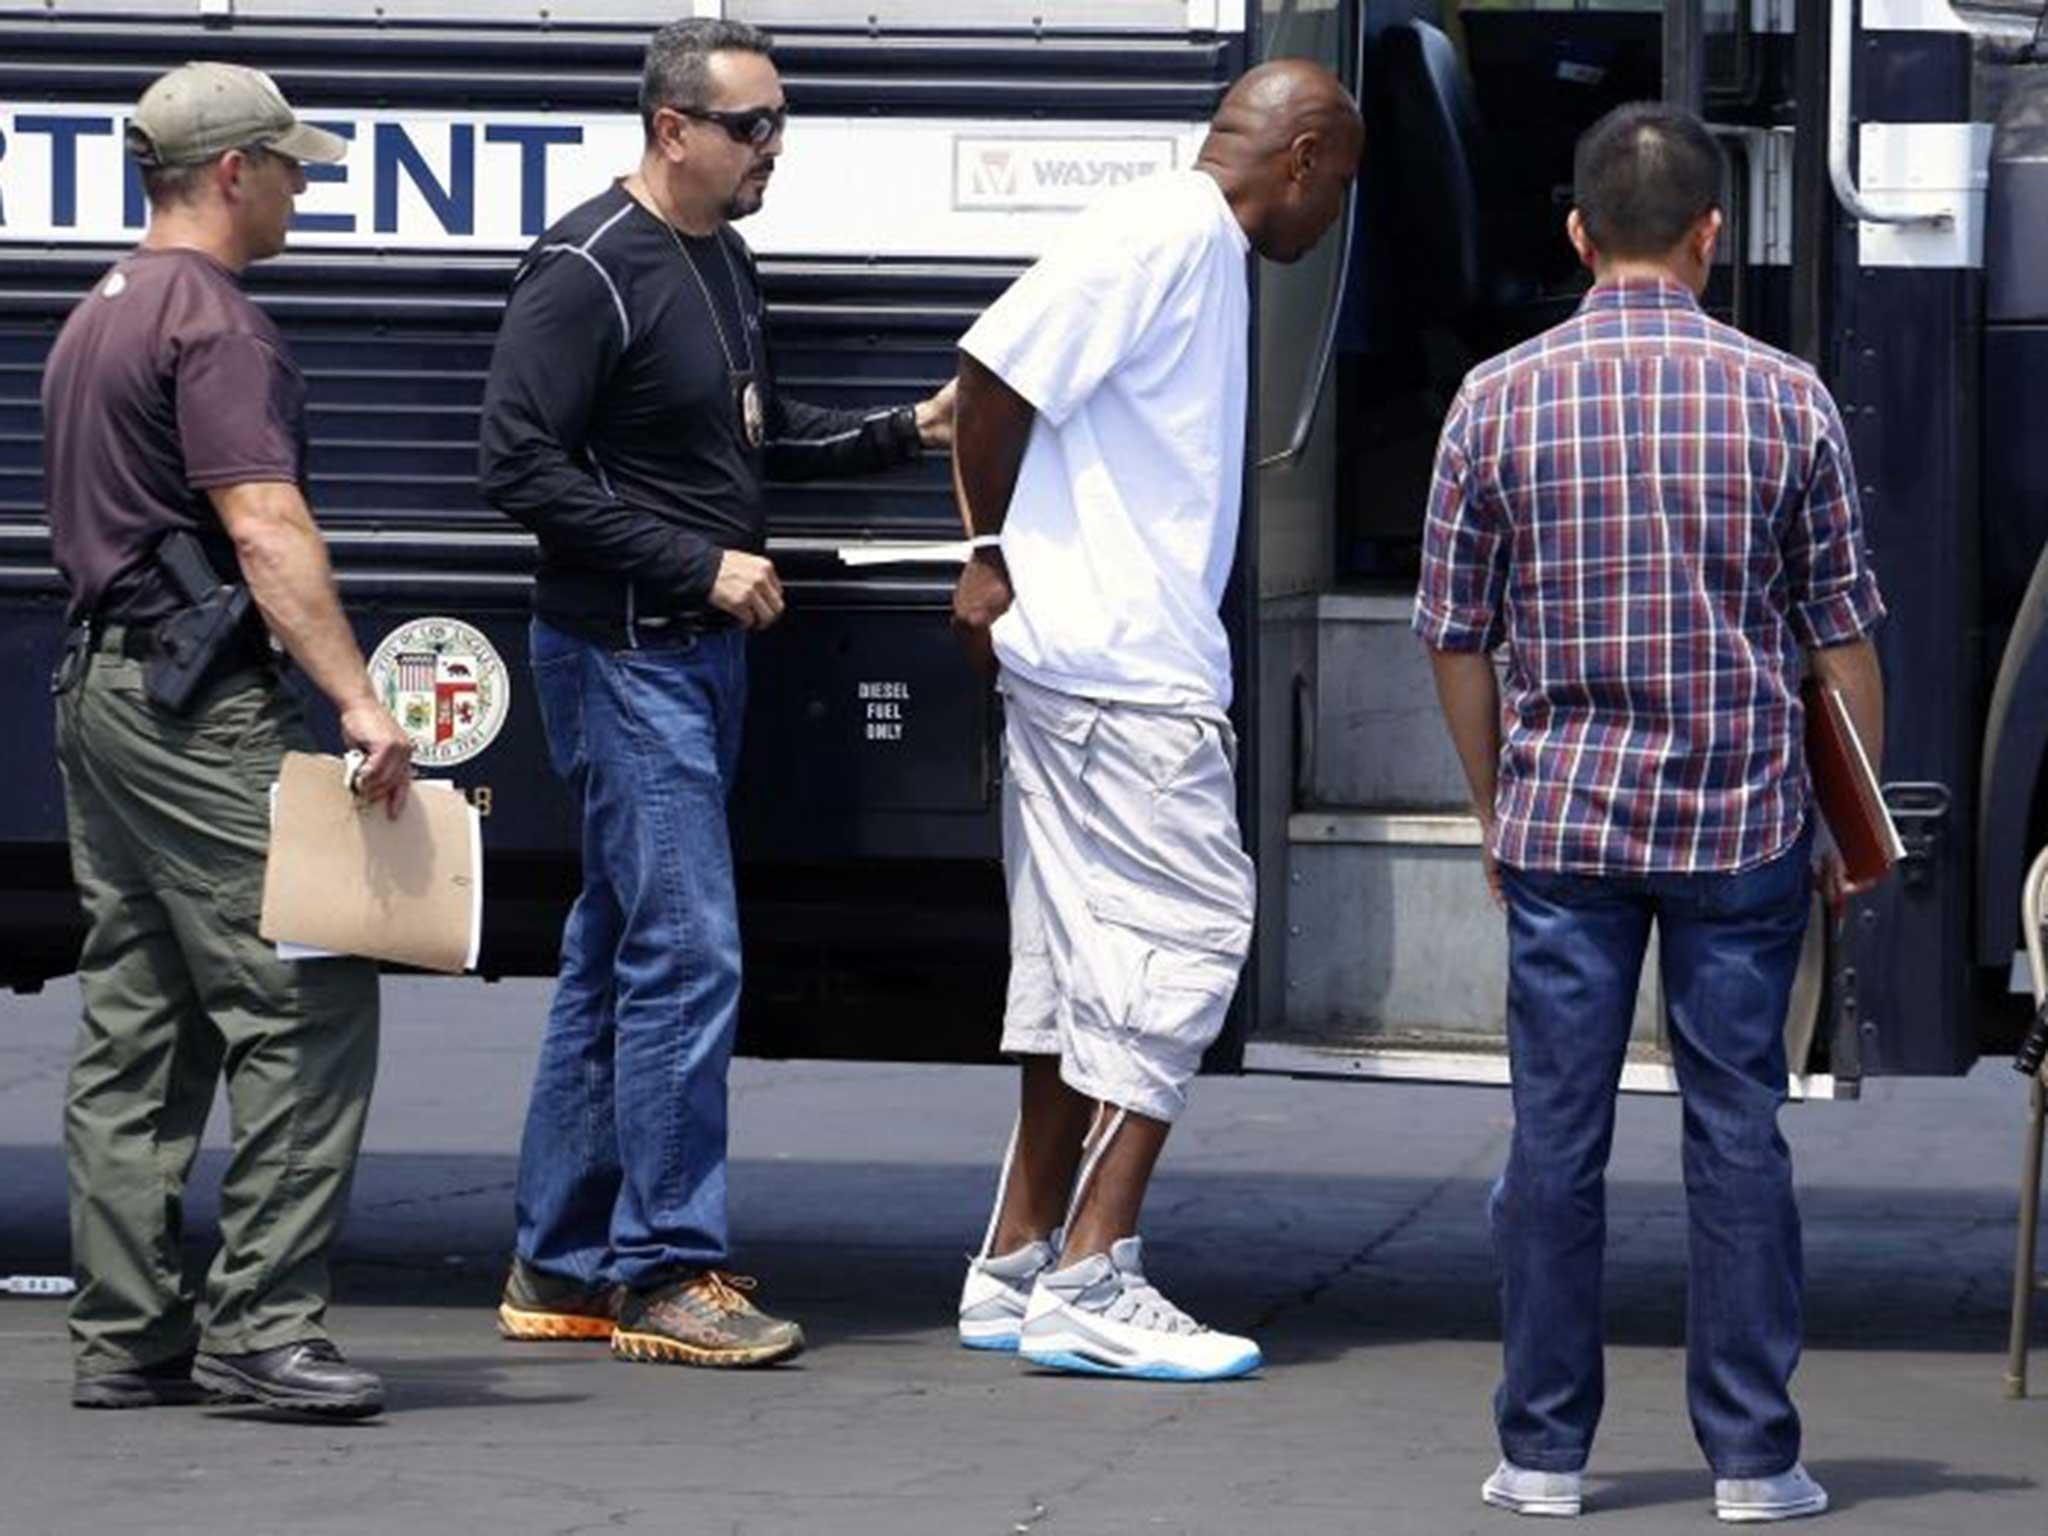 Gang dragnet sweeps up 72 of LA's hard-core Crips | The